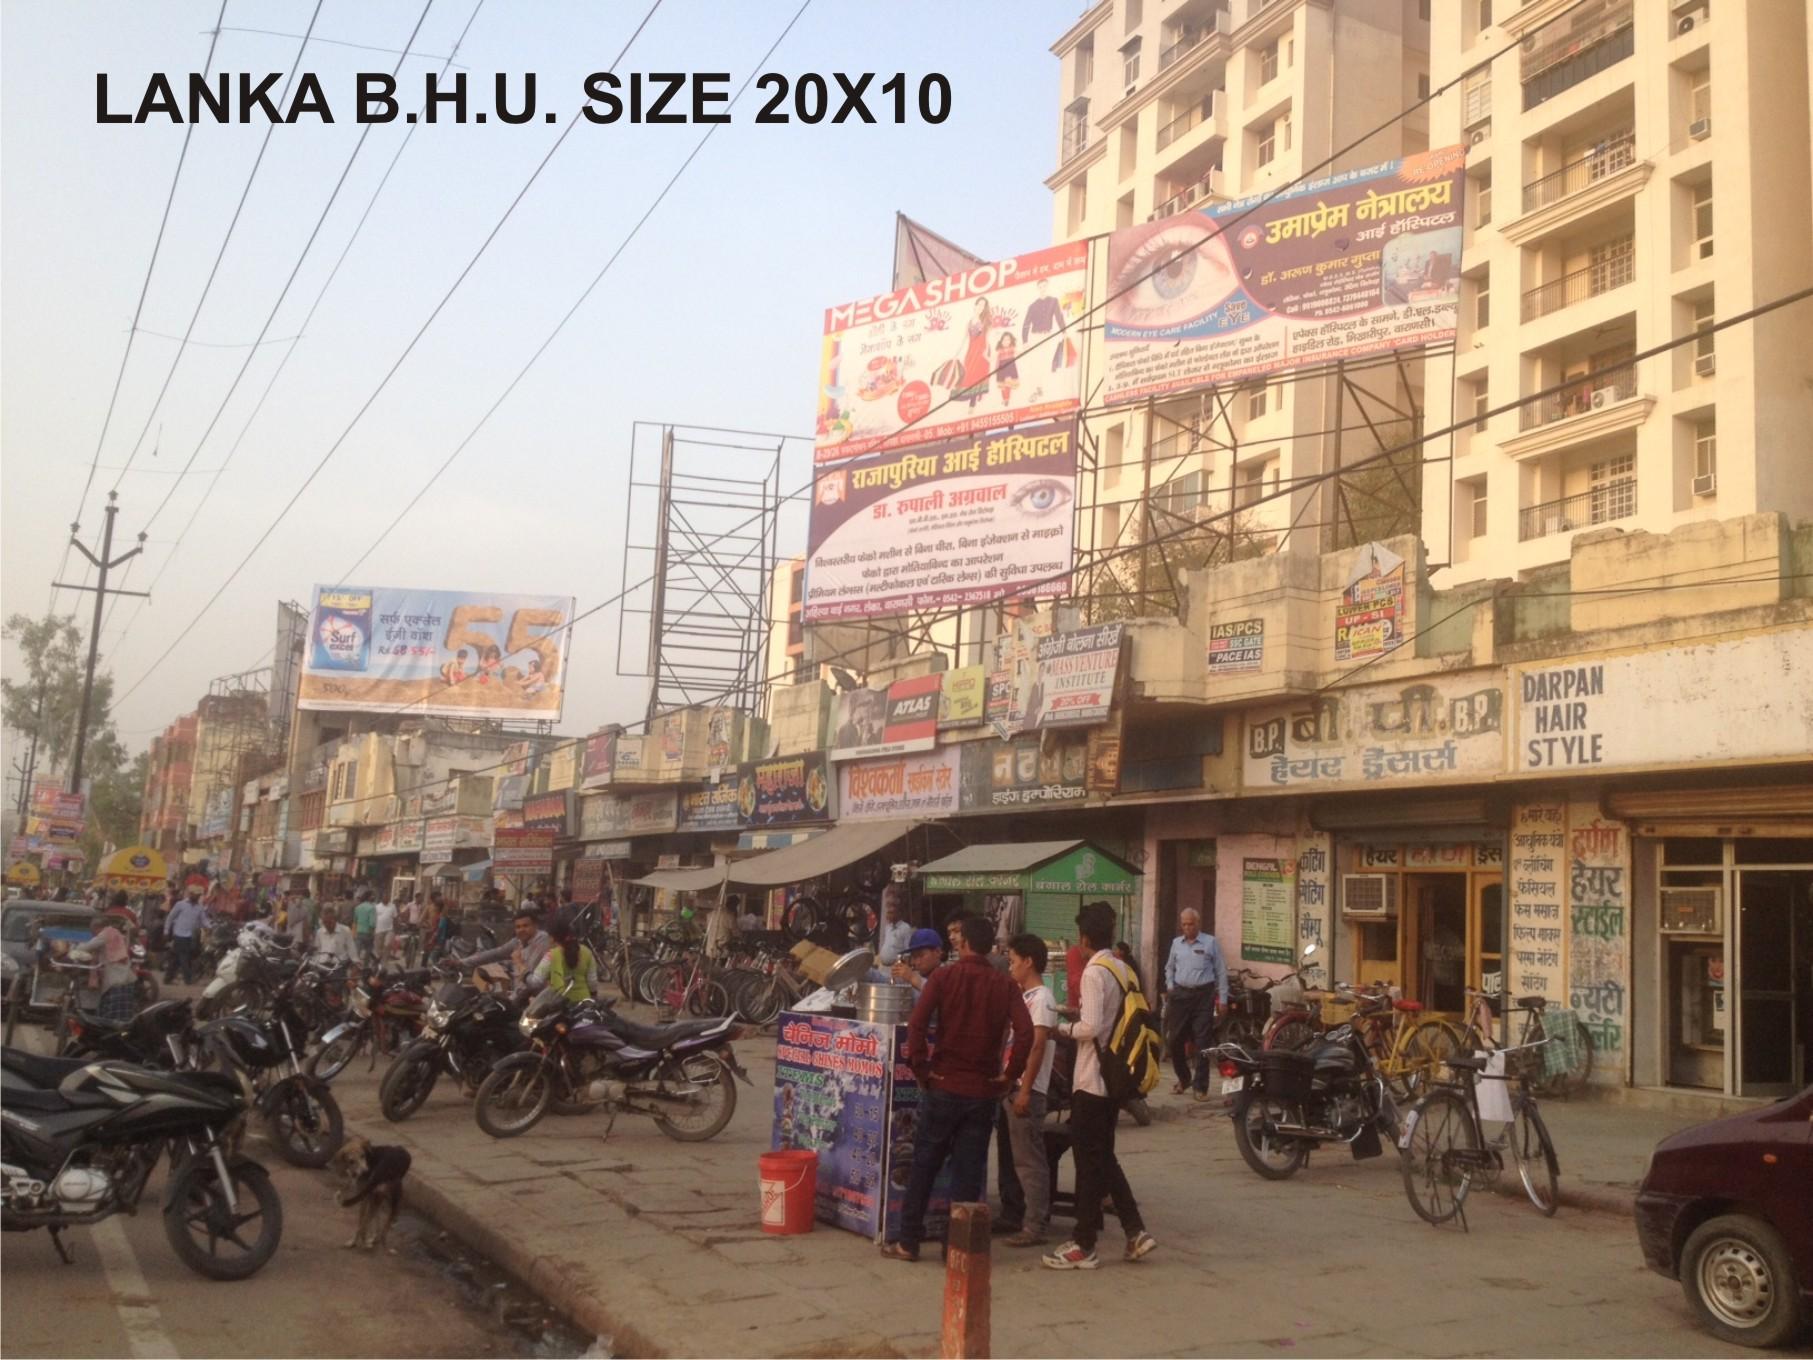 LANKA BHU, Varanasi